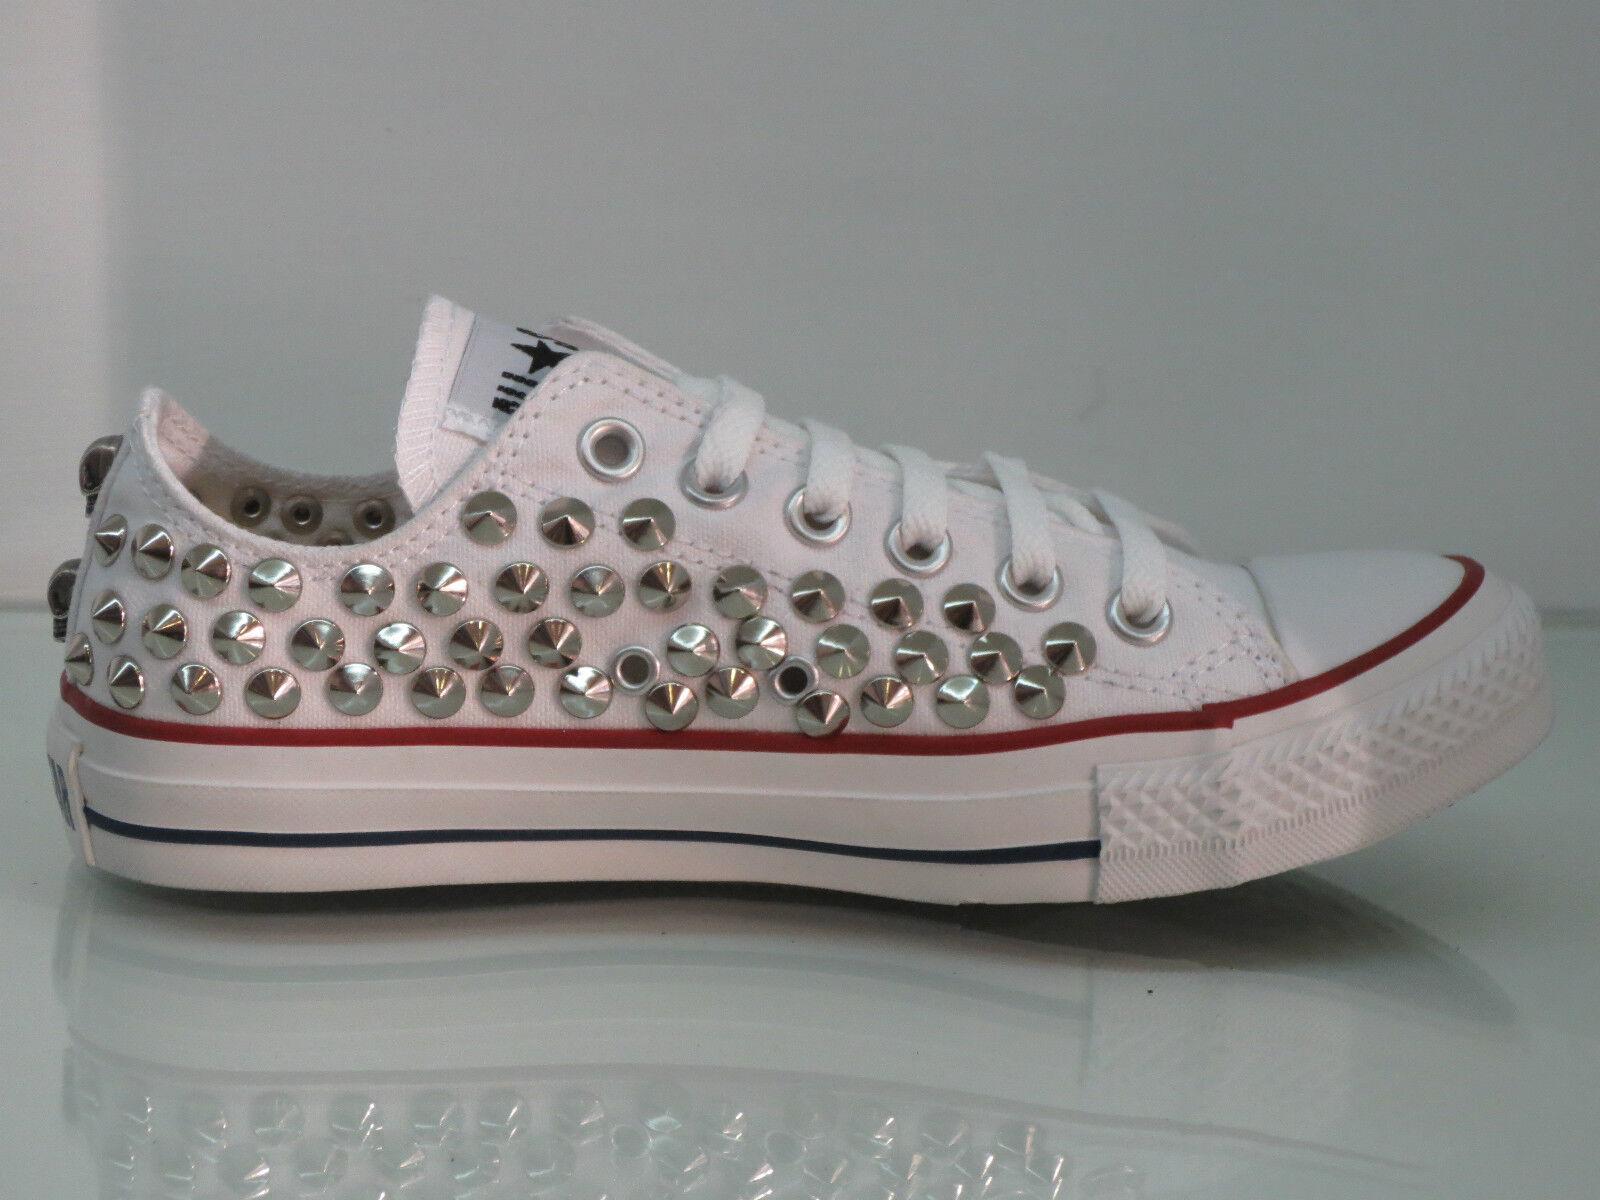 Converse all star OX OX OX  borchie teschi   bianco optical white artigianali 067be4